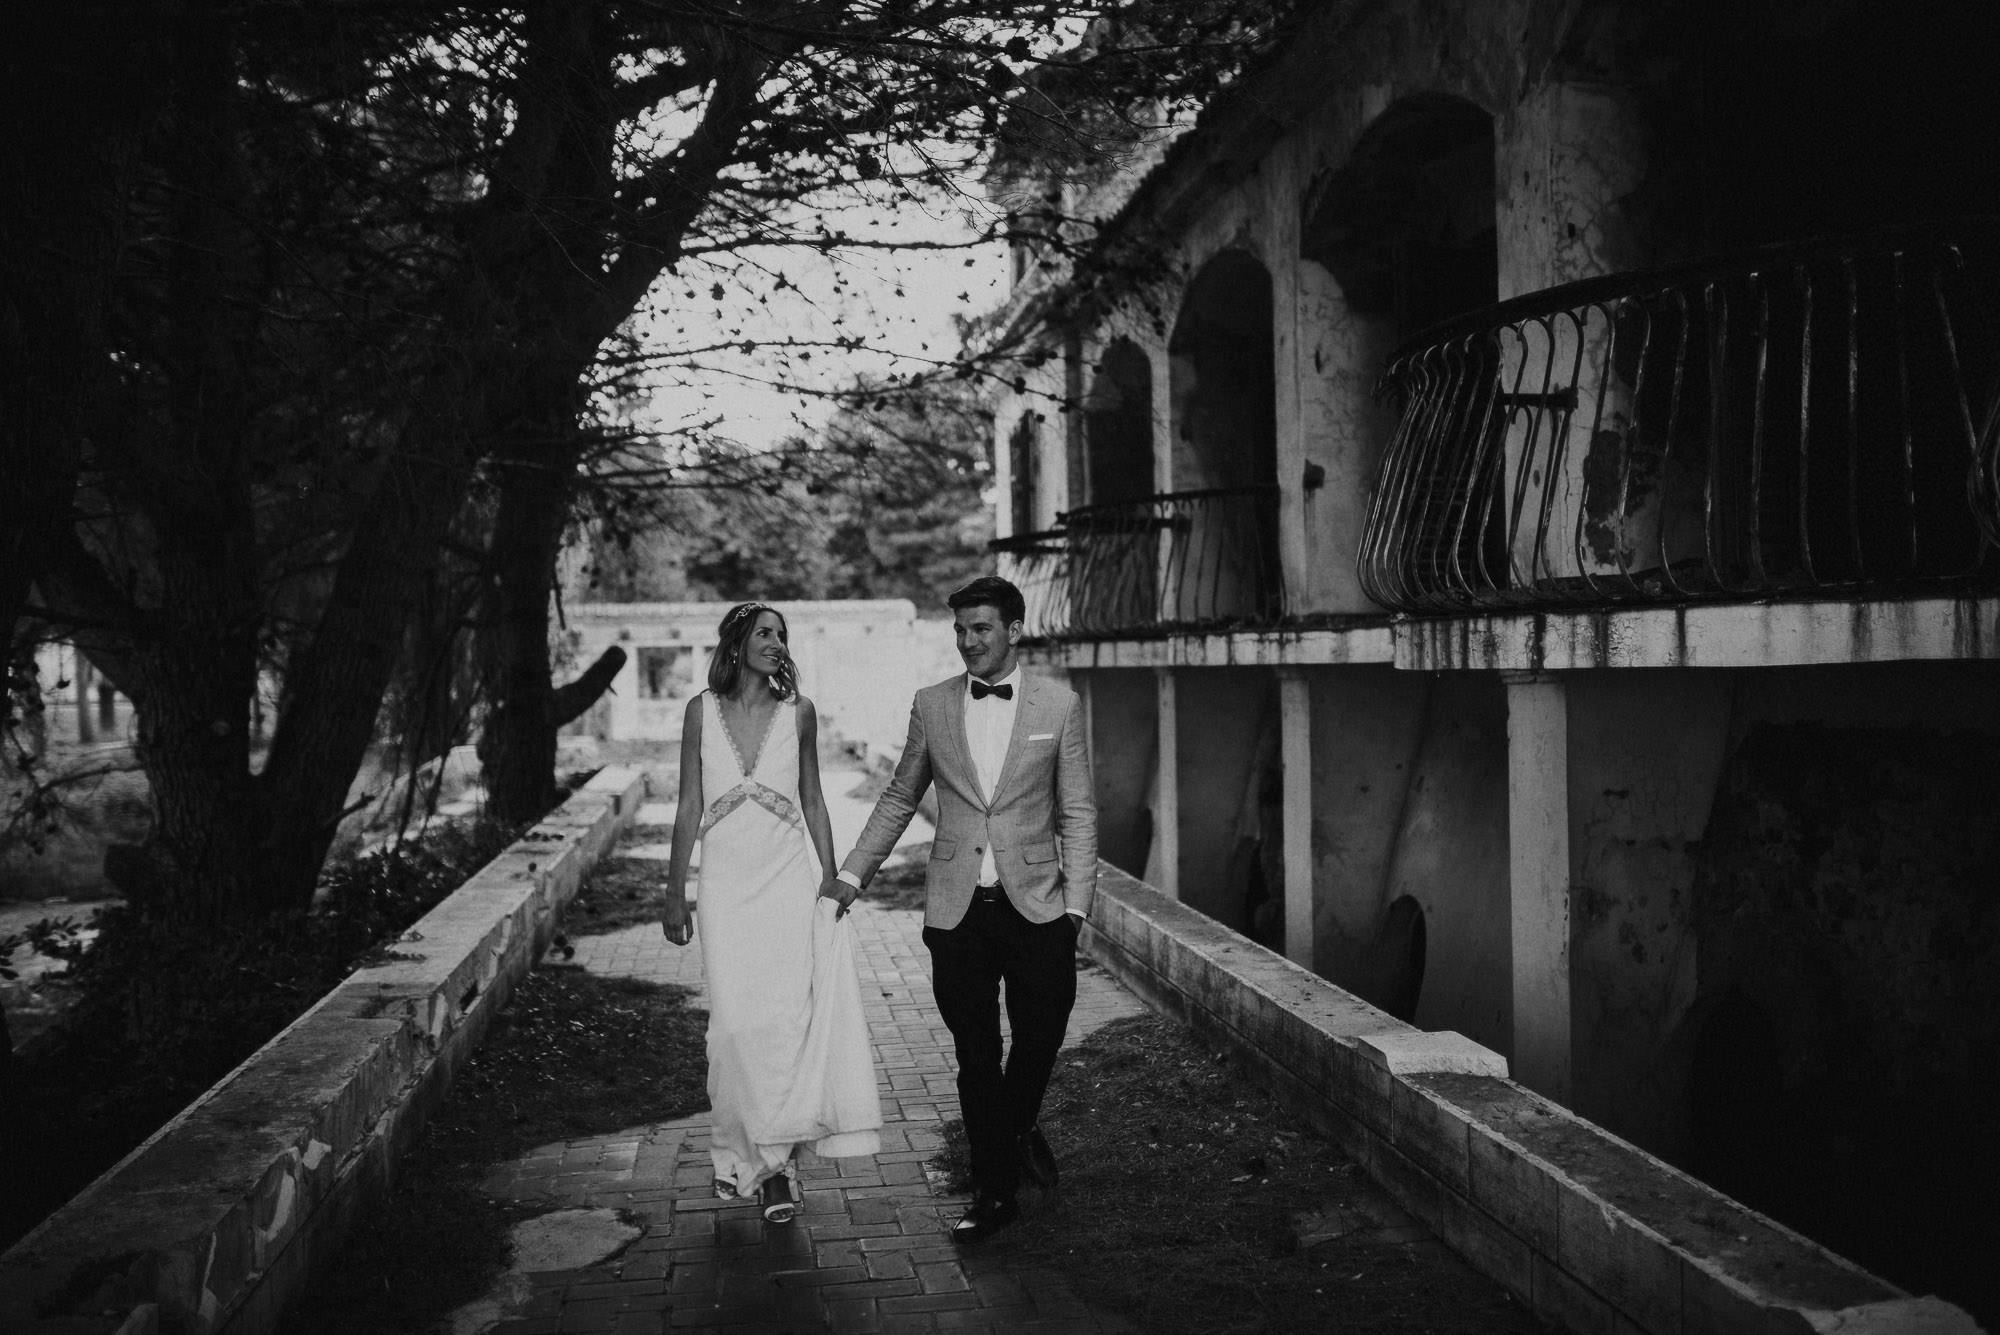 dubrovnik_croatia_wedding_photographer-jere_satamo-destination_weddings-113-web.jpg